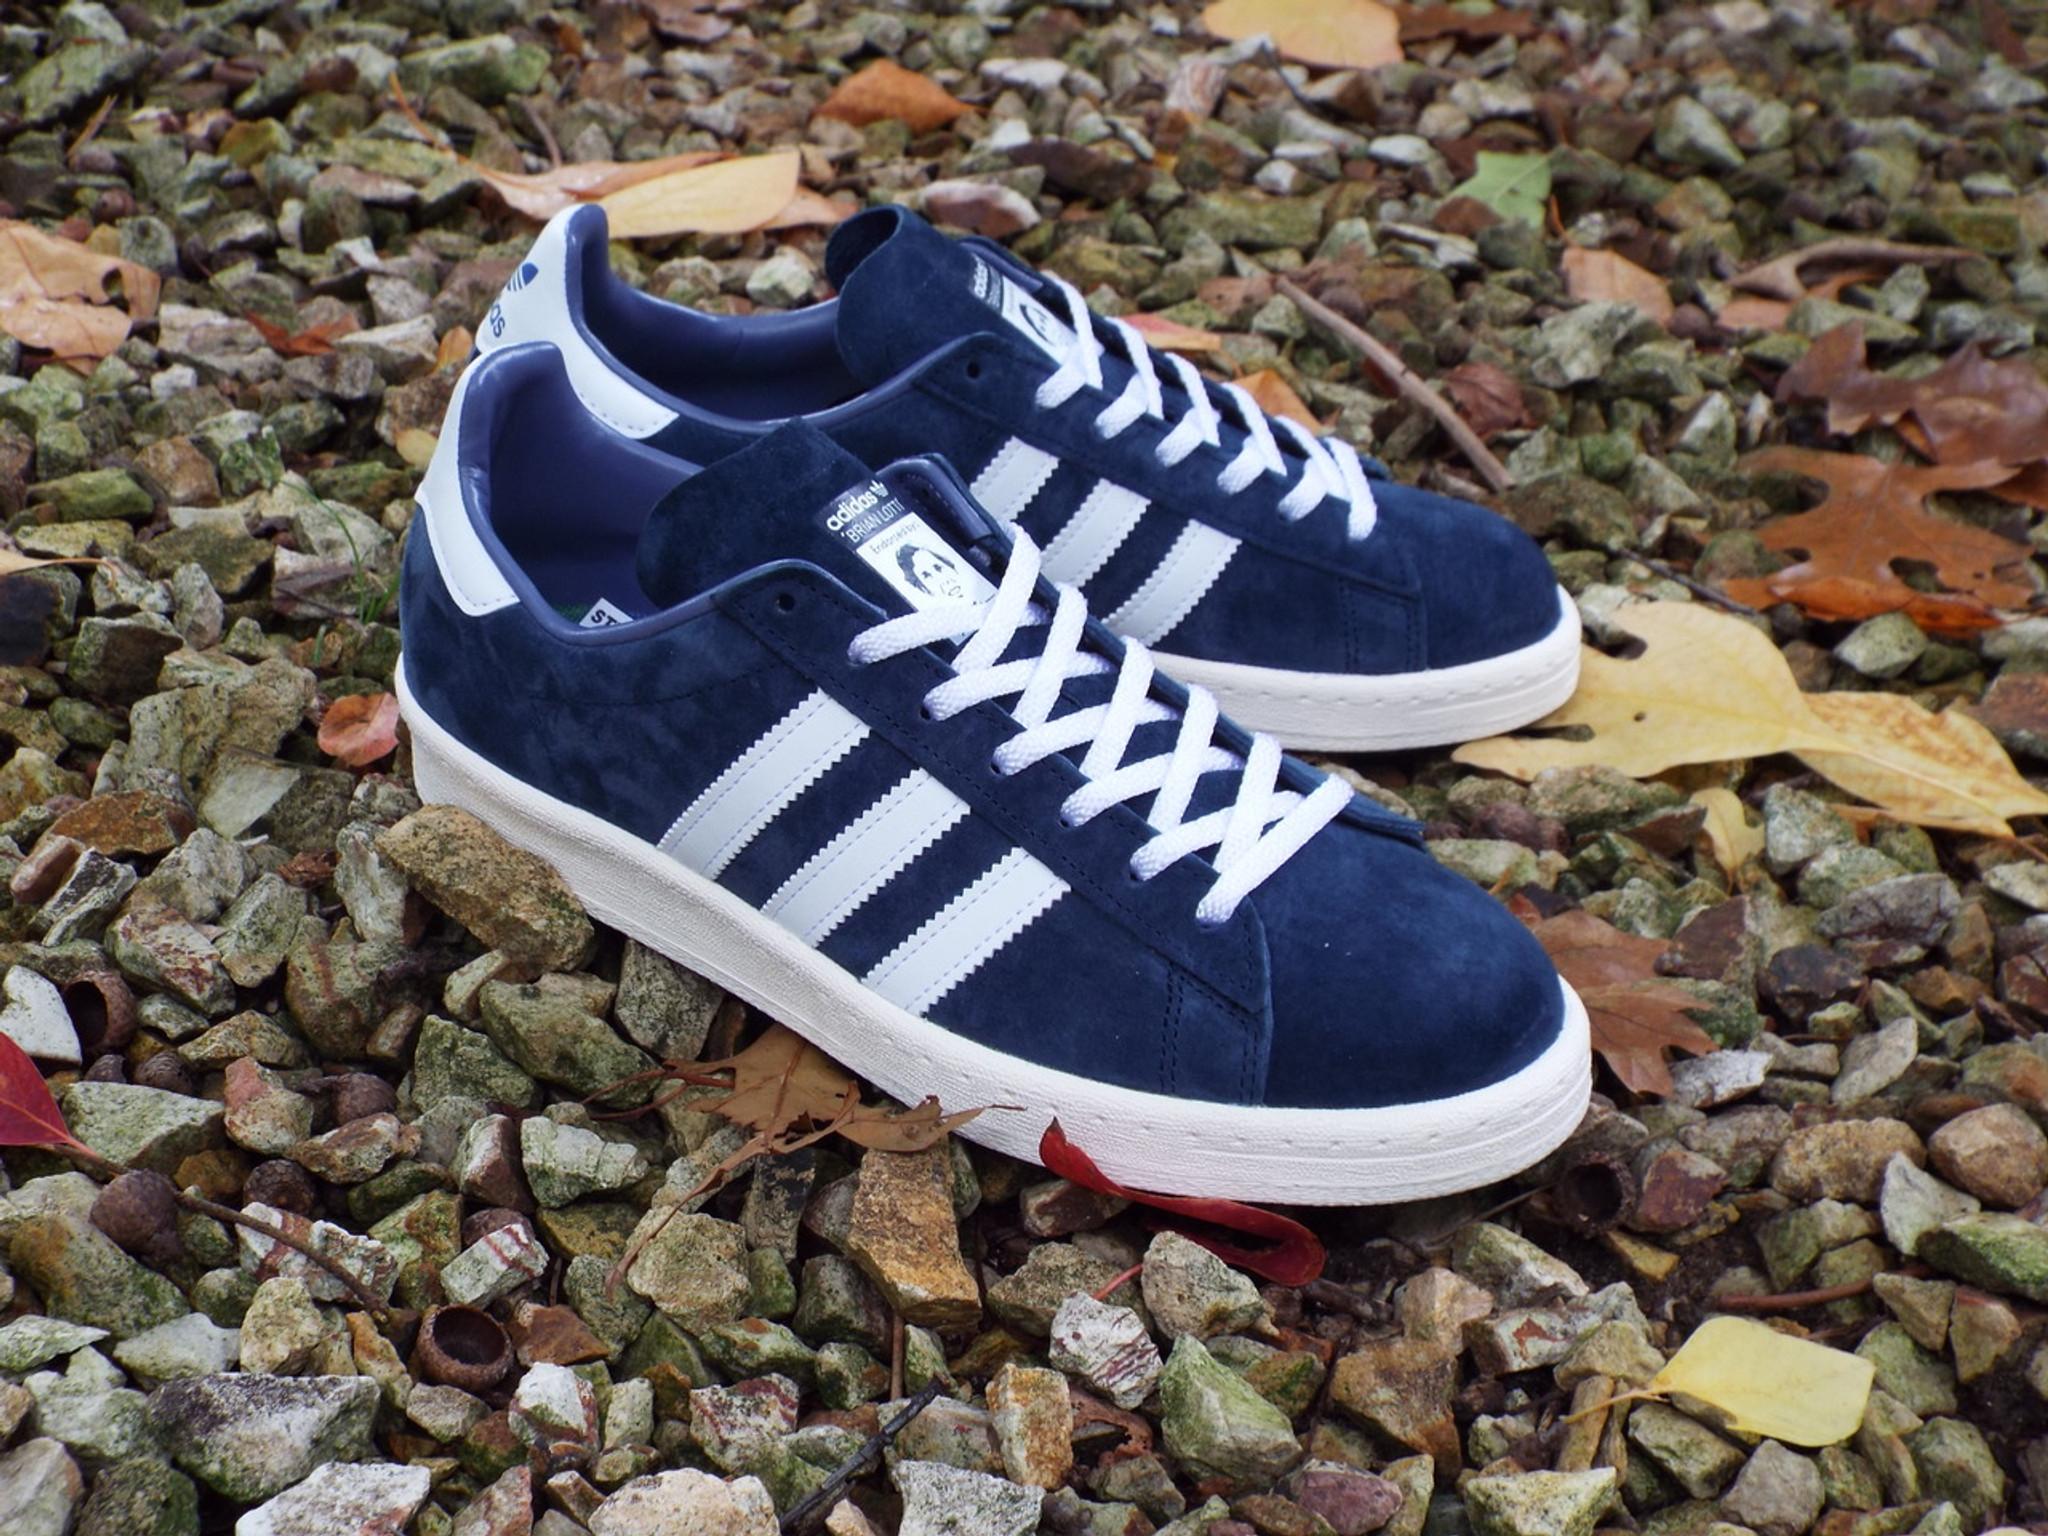 sélection premium b1a05 efaa2 Adidas Campus 80s RYR (Brian Lotti) Shoes - Collegiate Navy/White